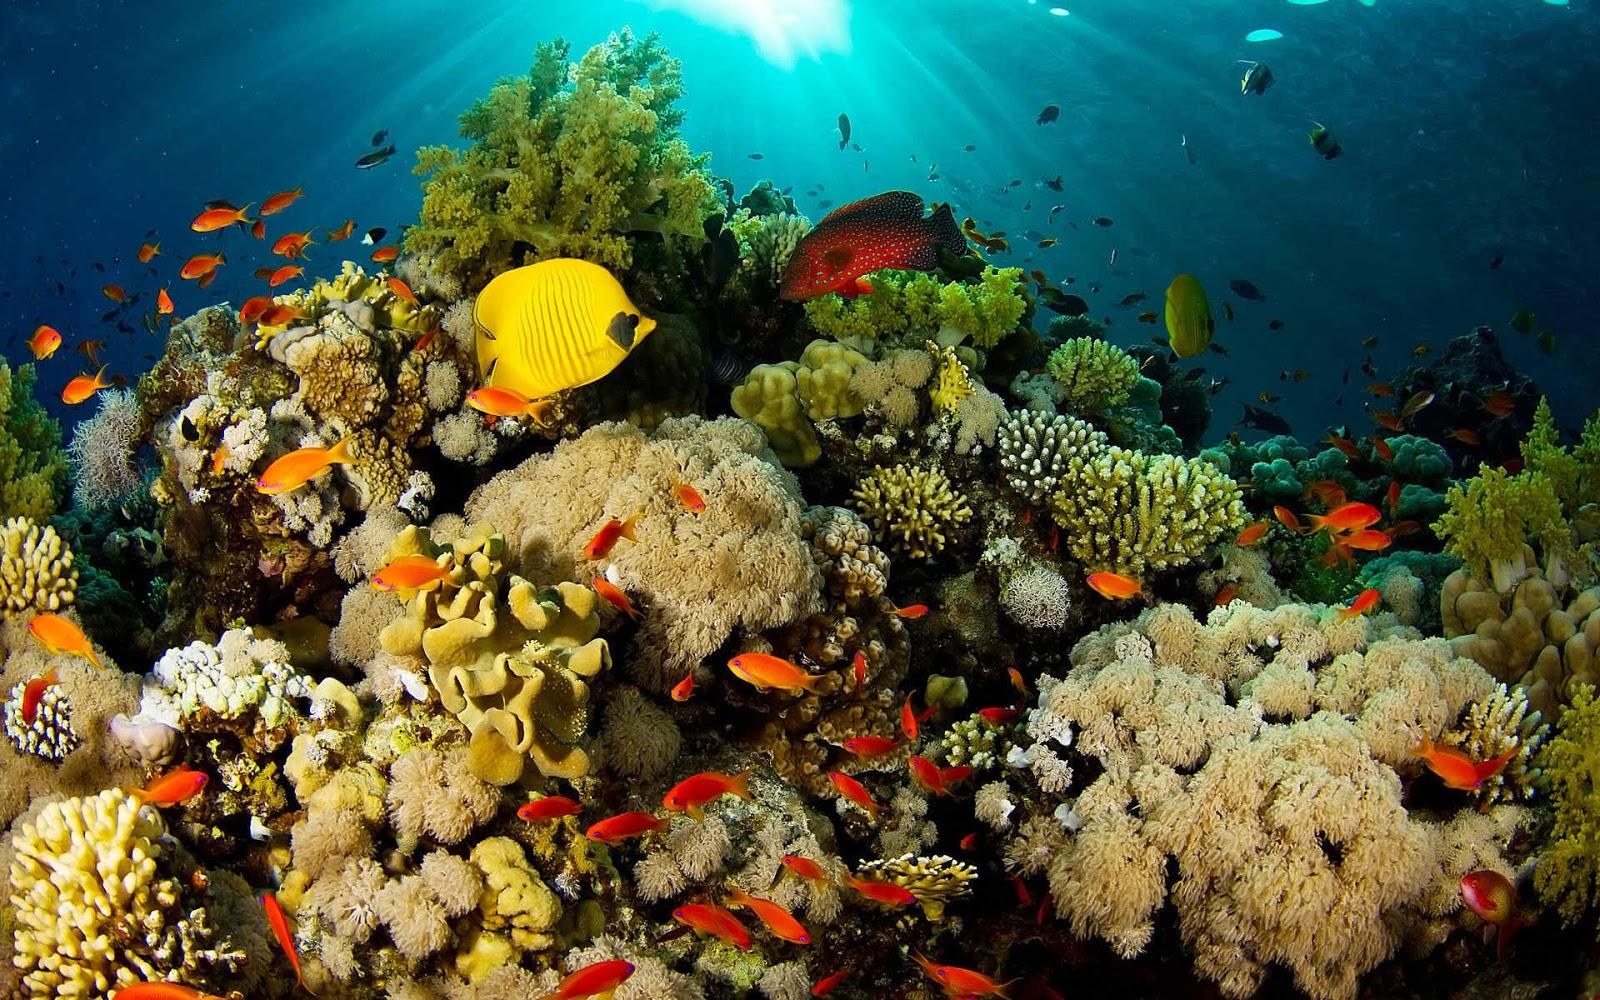 Arrecifes de Coral: Sabias que???: arrecifesdelcapitannemo.blogspot.com/2012/10/datos-de-interes-de...